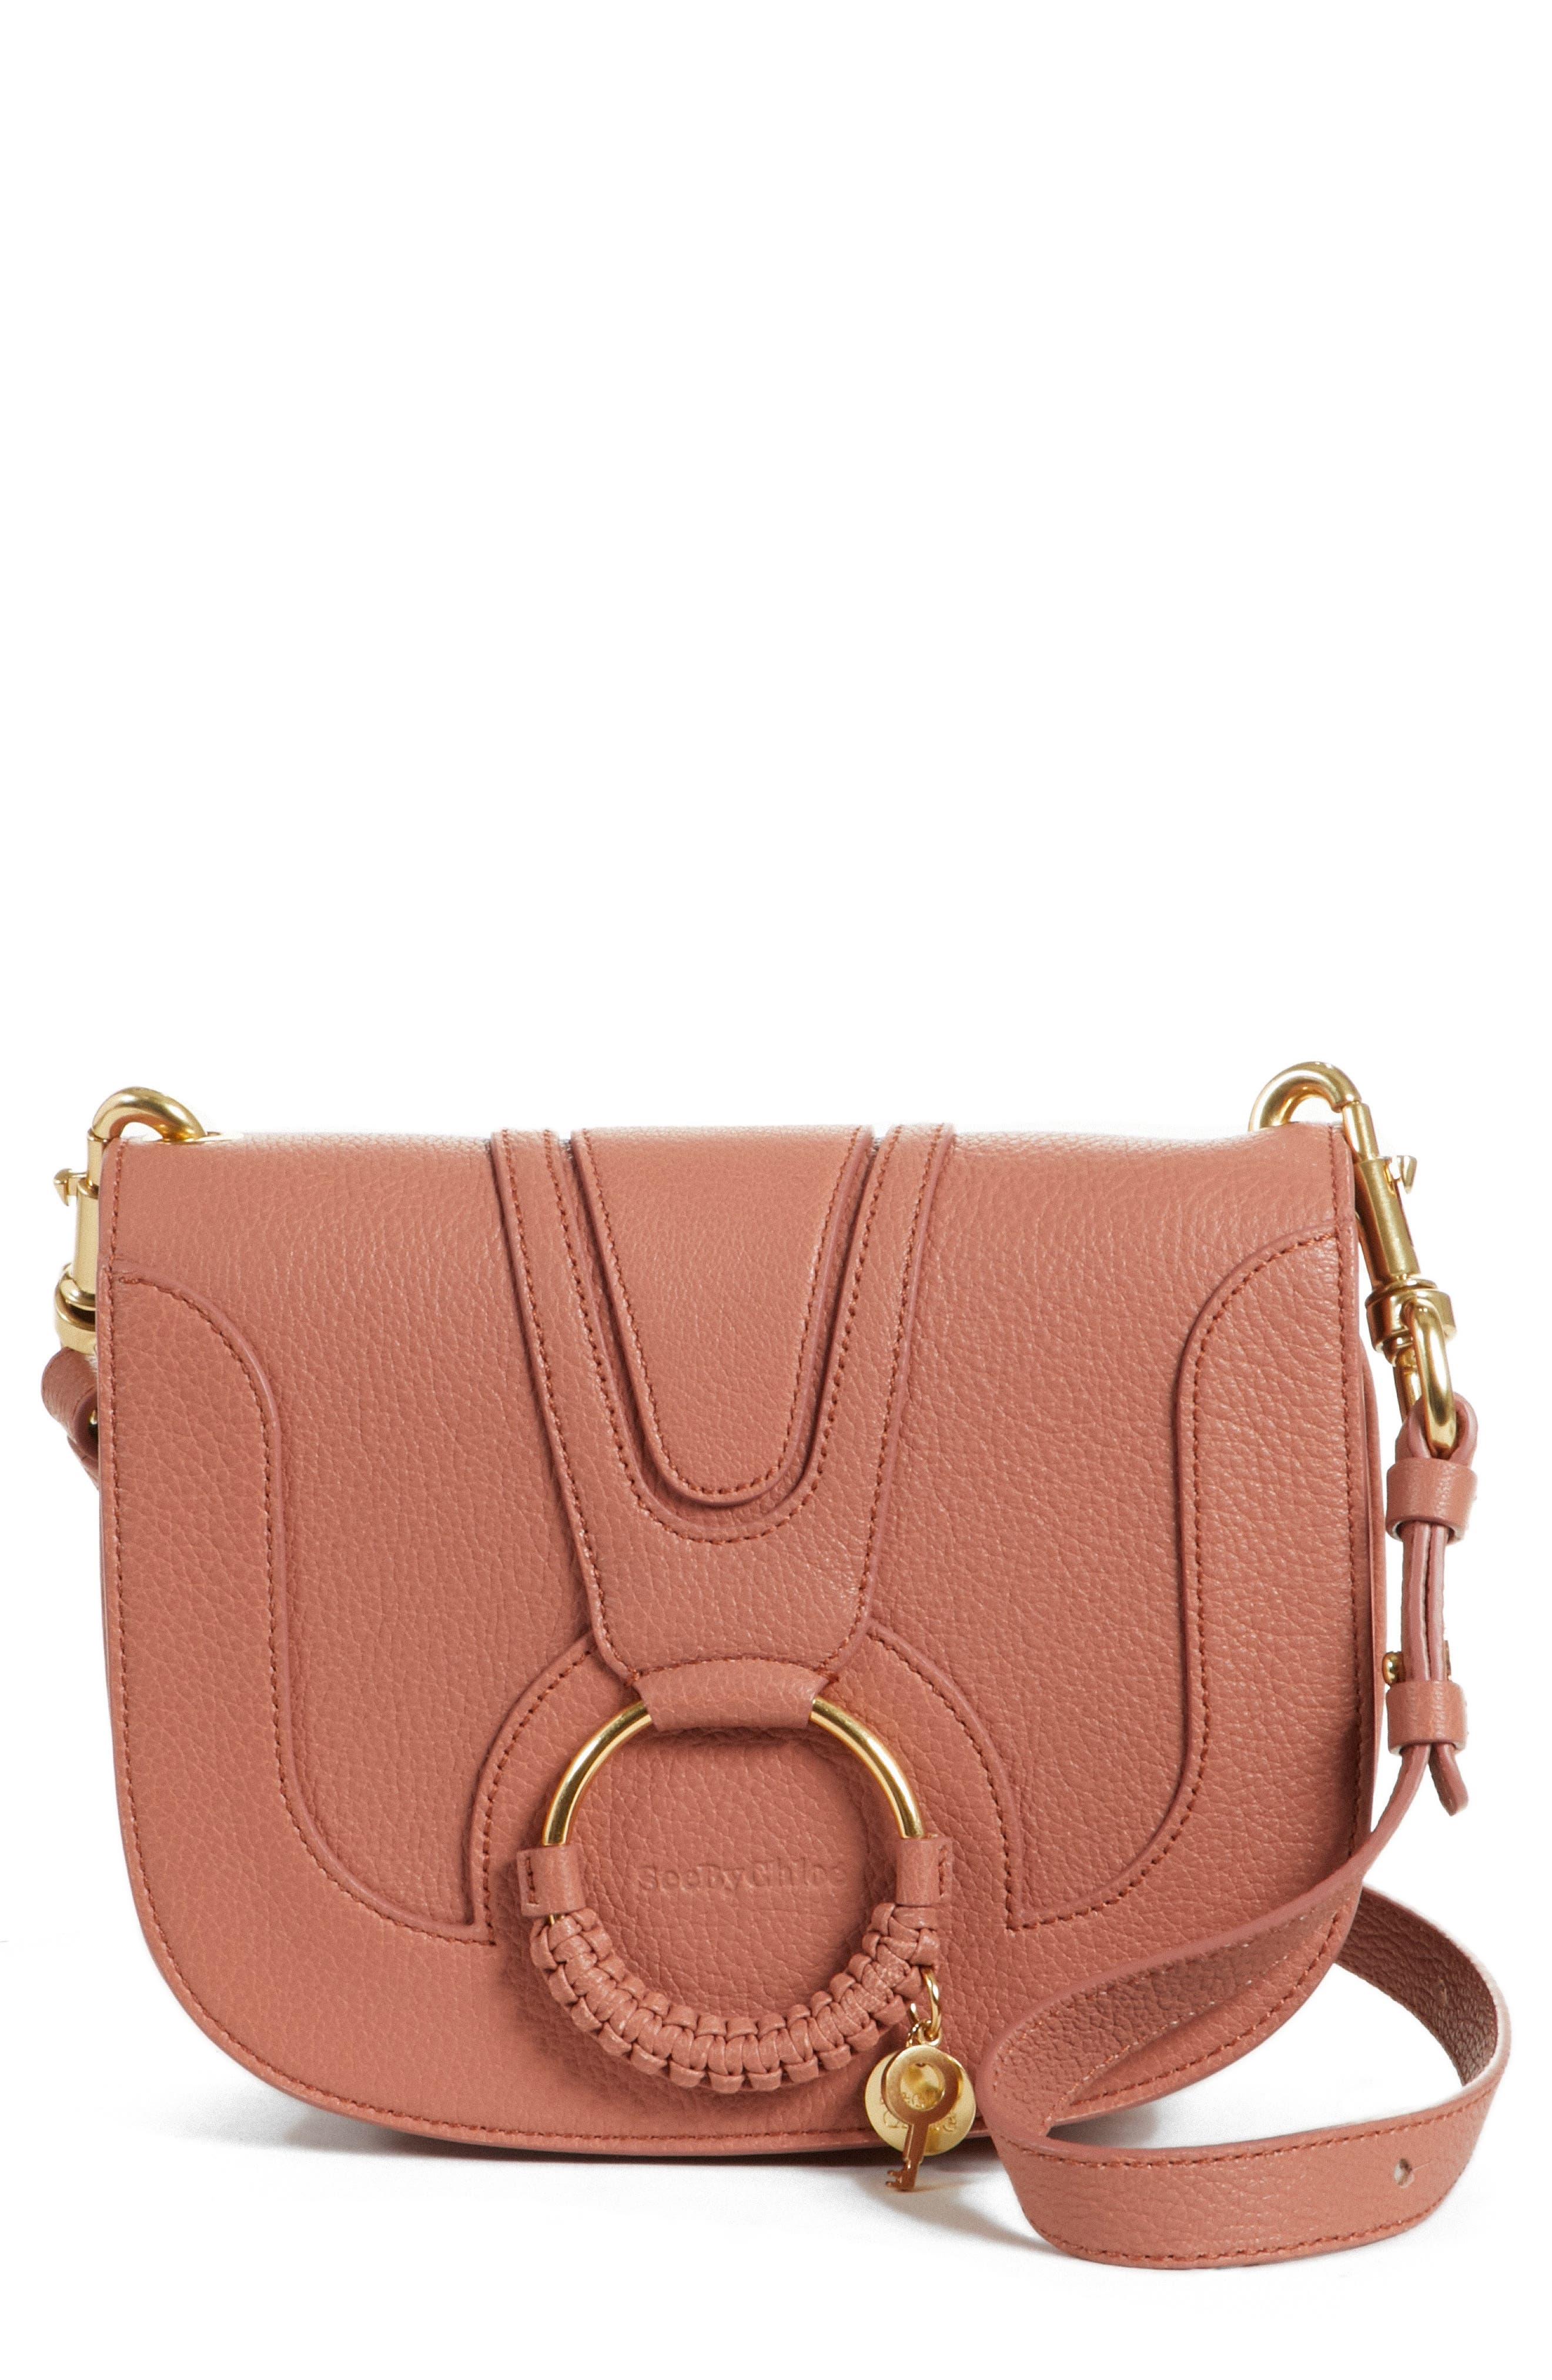 Hana Small Leather Crossbody Bag,                             Main thumbnail 3, color,